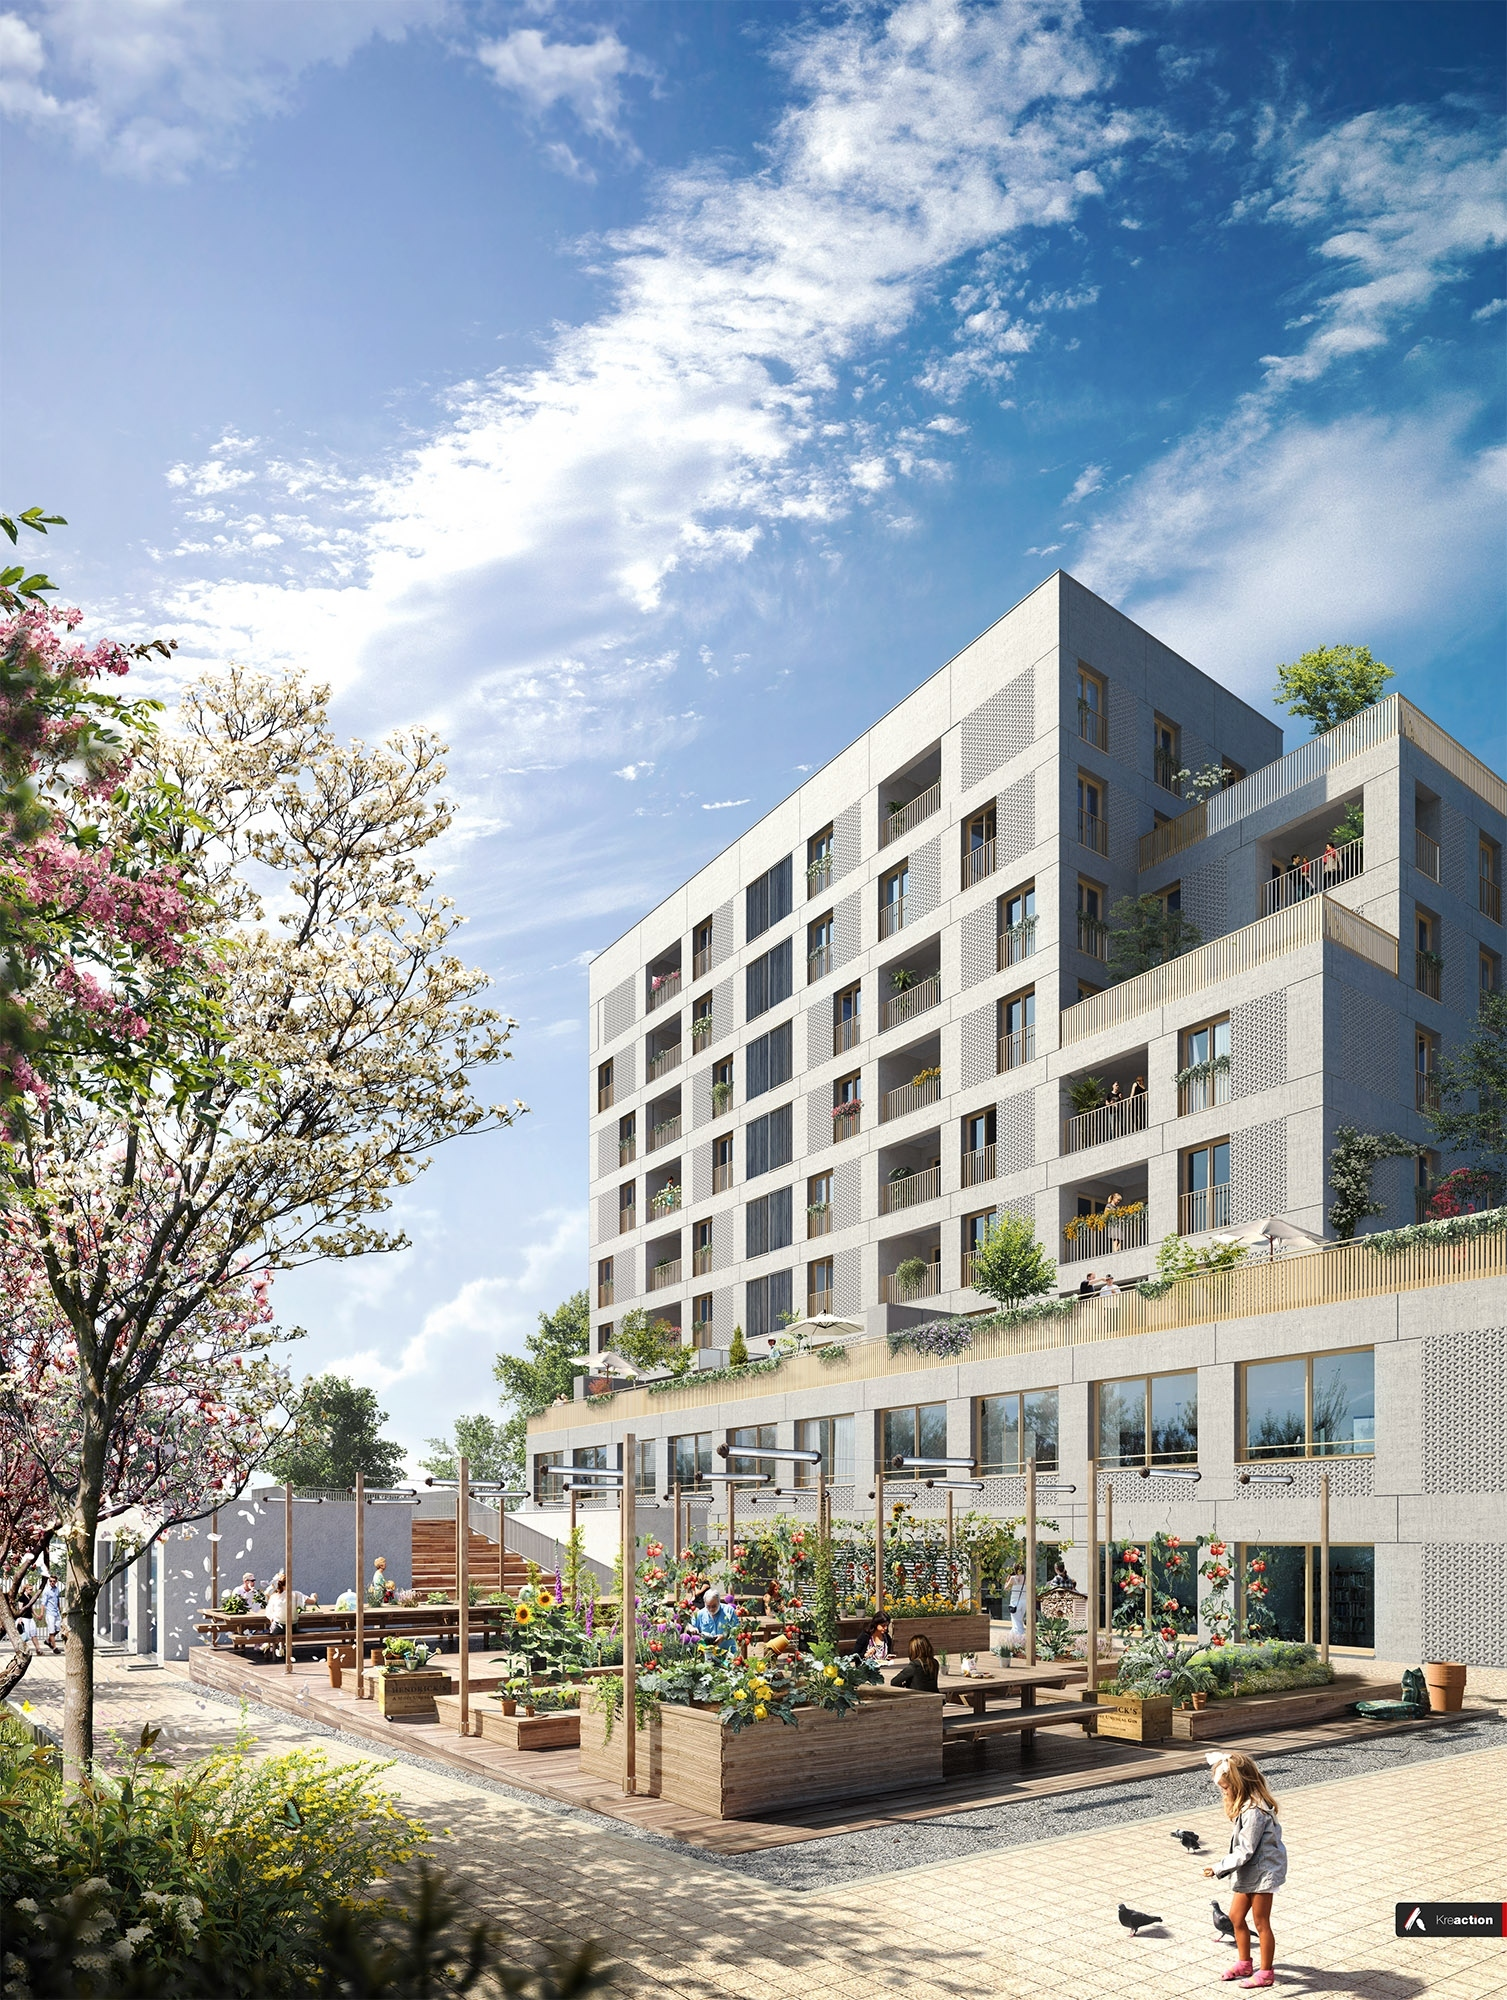 Programme immobilier so smart strasbourg 1 bien neuf for Immobilier strasbourg neuf